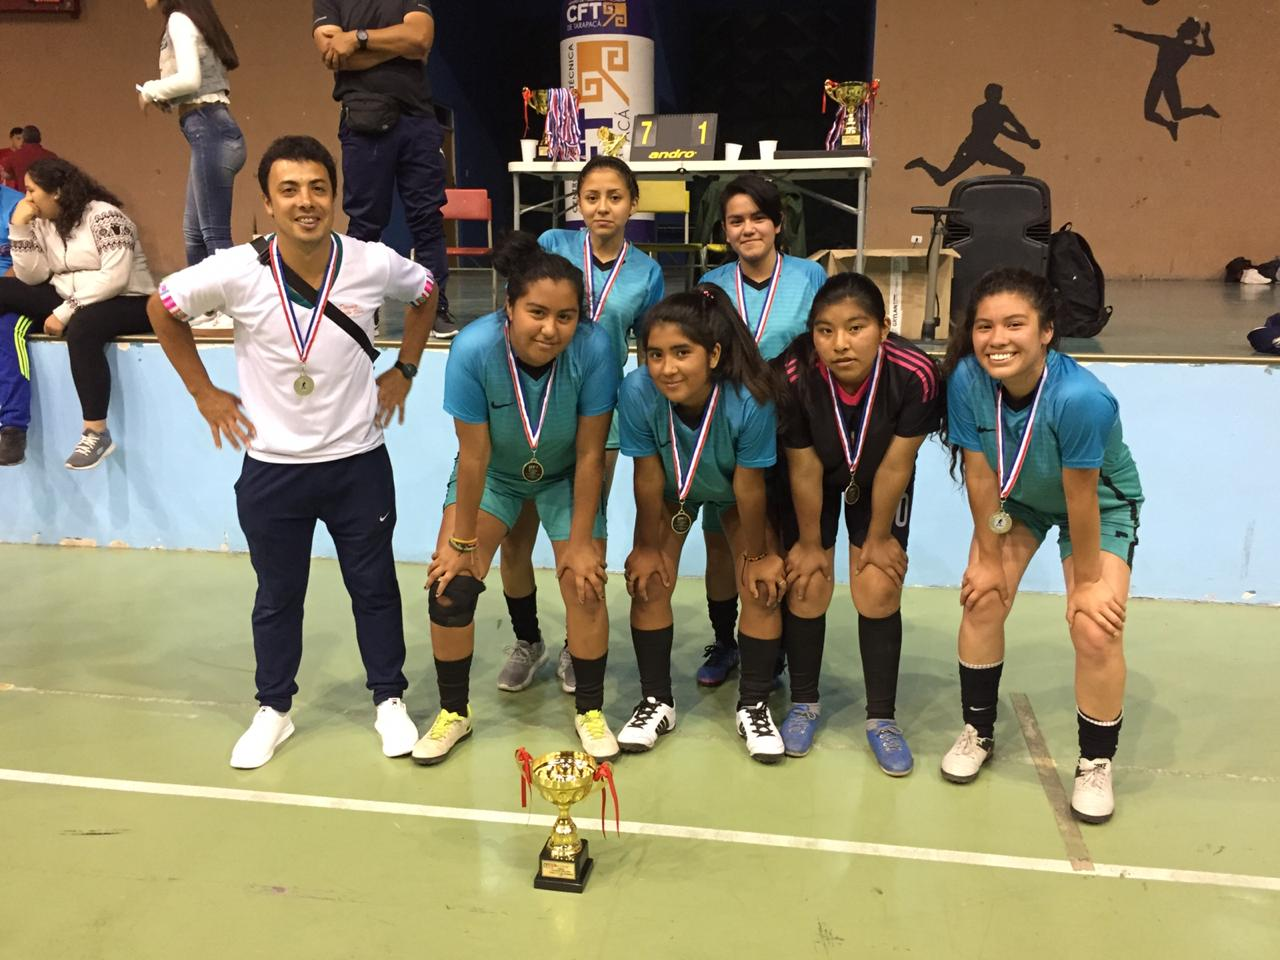 segundo lugar damas Colegio Chile Norte.